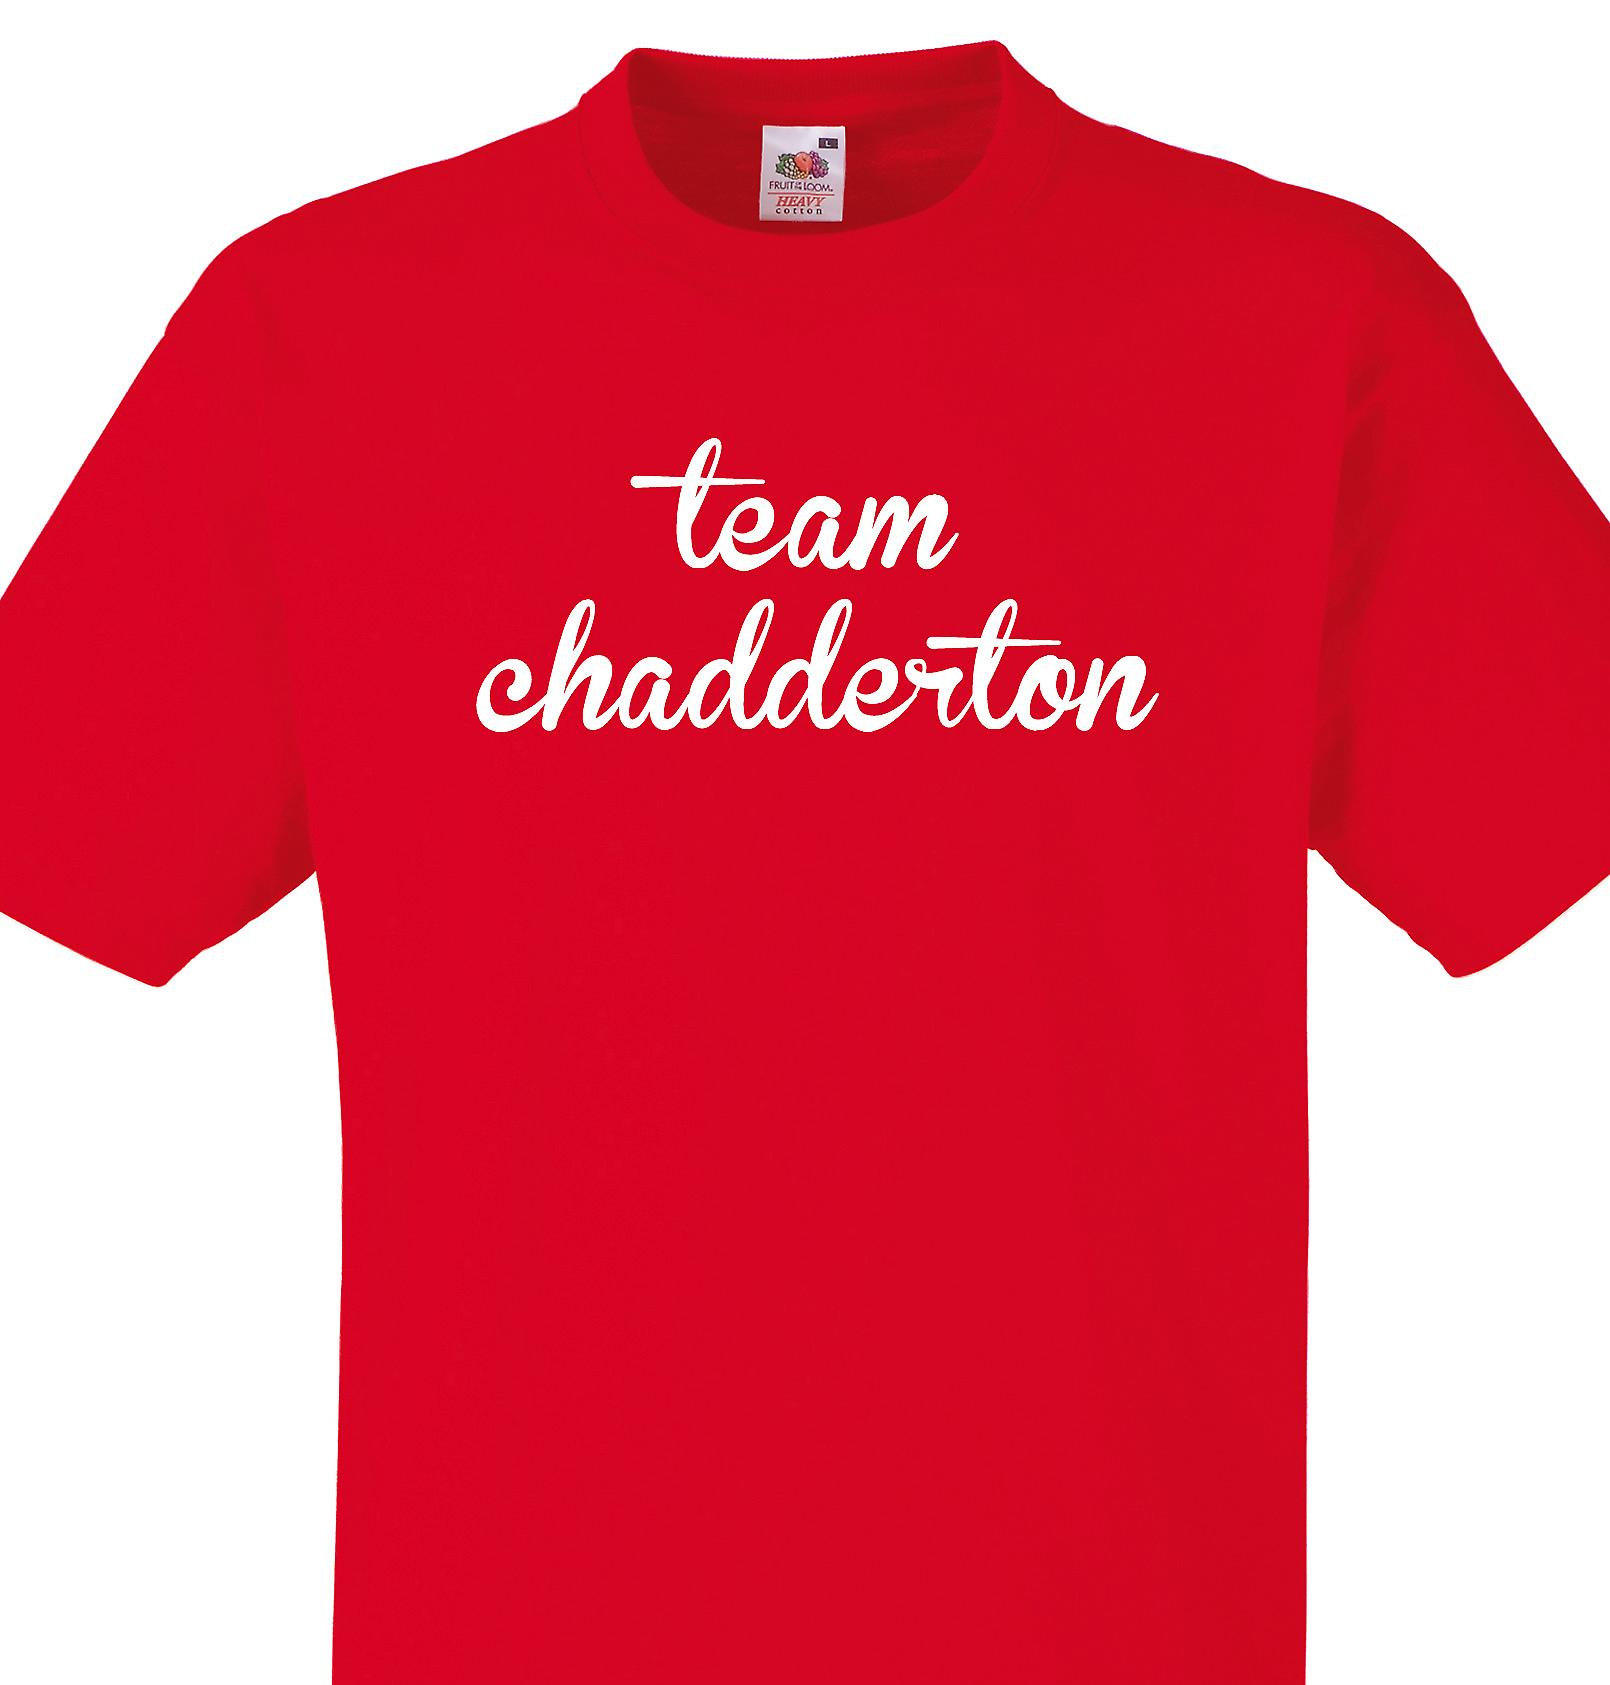 Team Chadderton Red T shirt